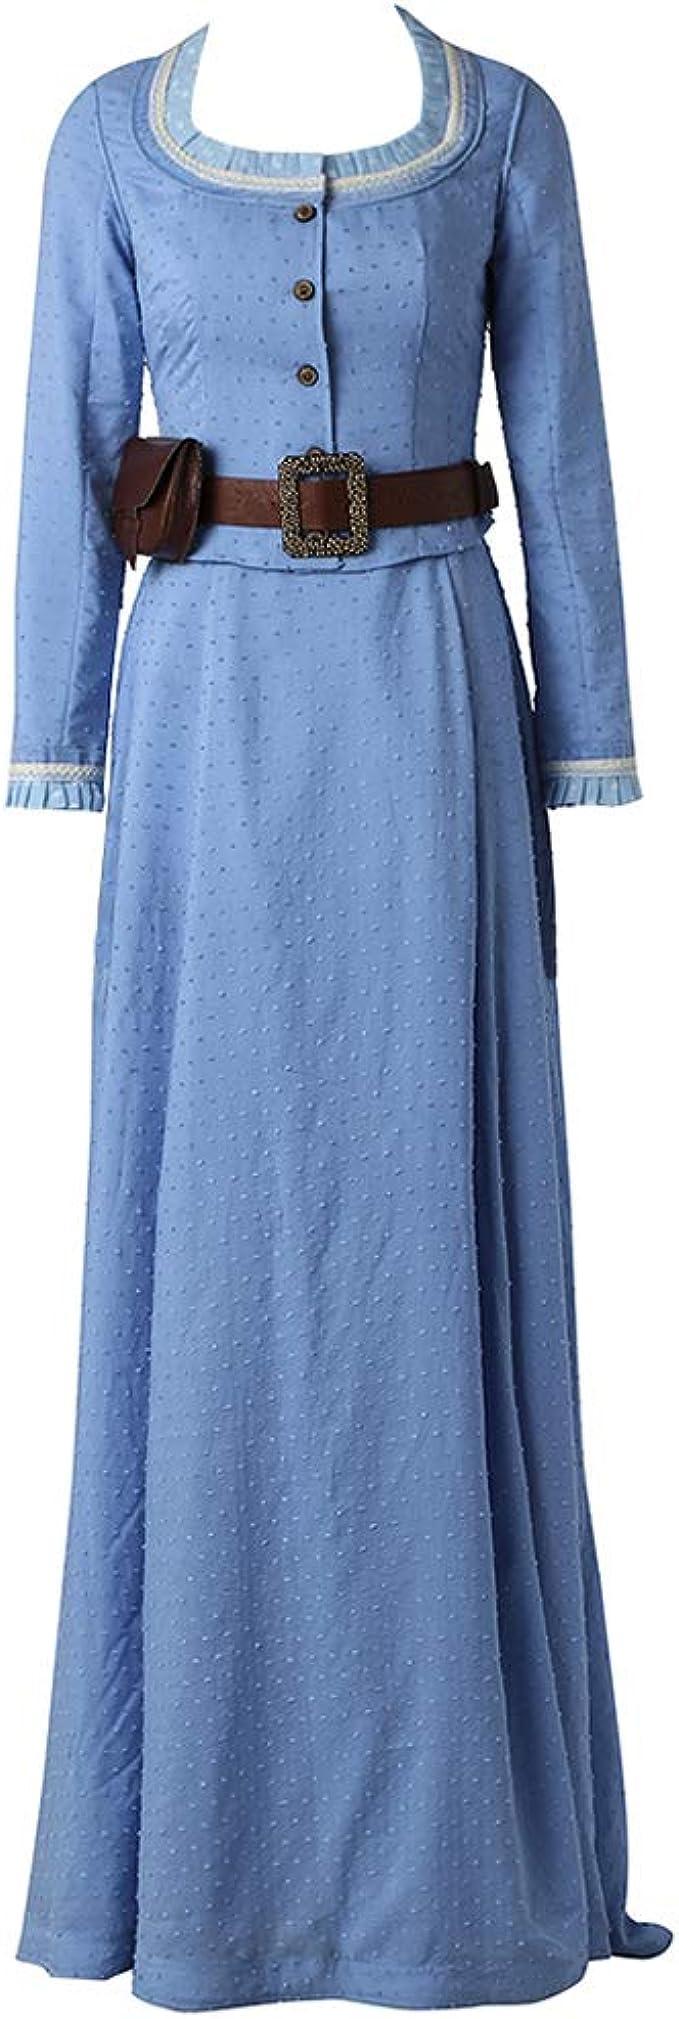 Dolores Abernathy Costume Adult West World Western Halloween Fancy Dress